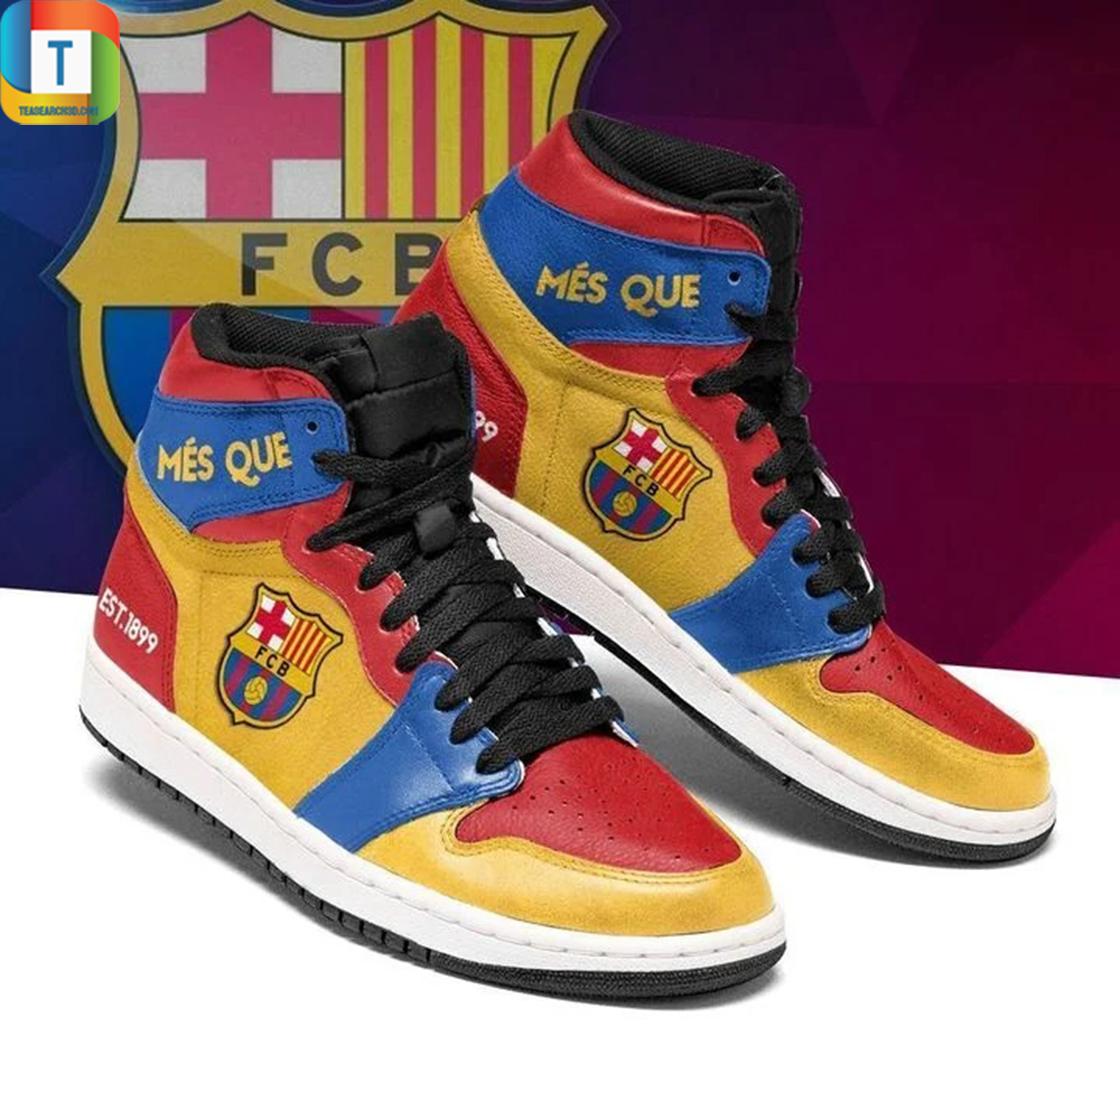 Barcelona jordan high top high top shoes